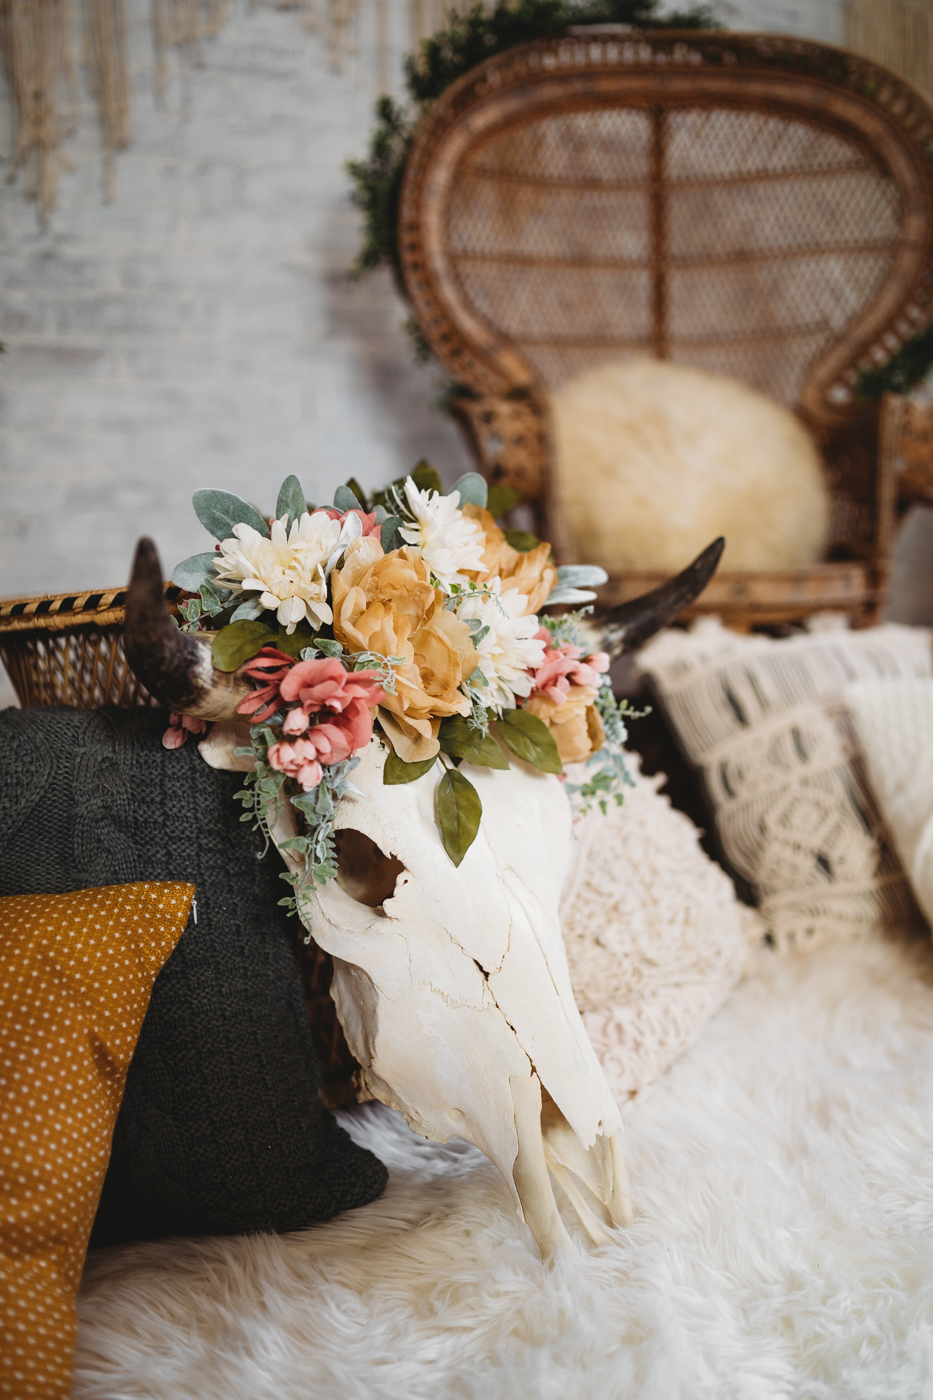 FortSt.John_photographer_TyraEPhotography_Wedding_Couple_Family_Photograhy_DawsonCreek_Elopement_Bride_Boduoir_Portraits-00043.jpg